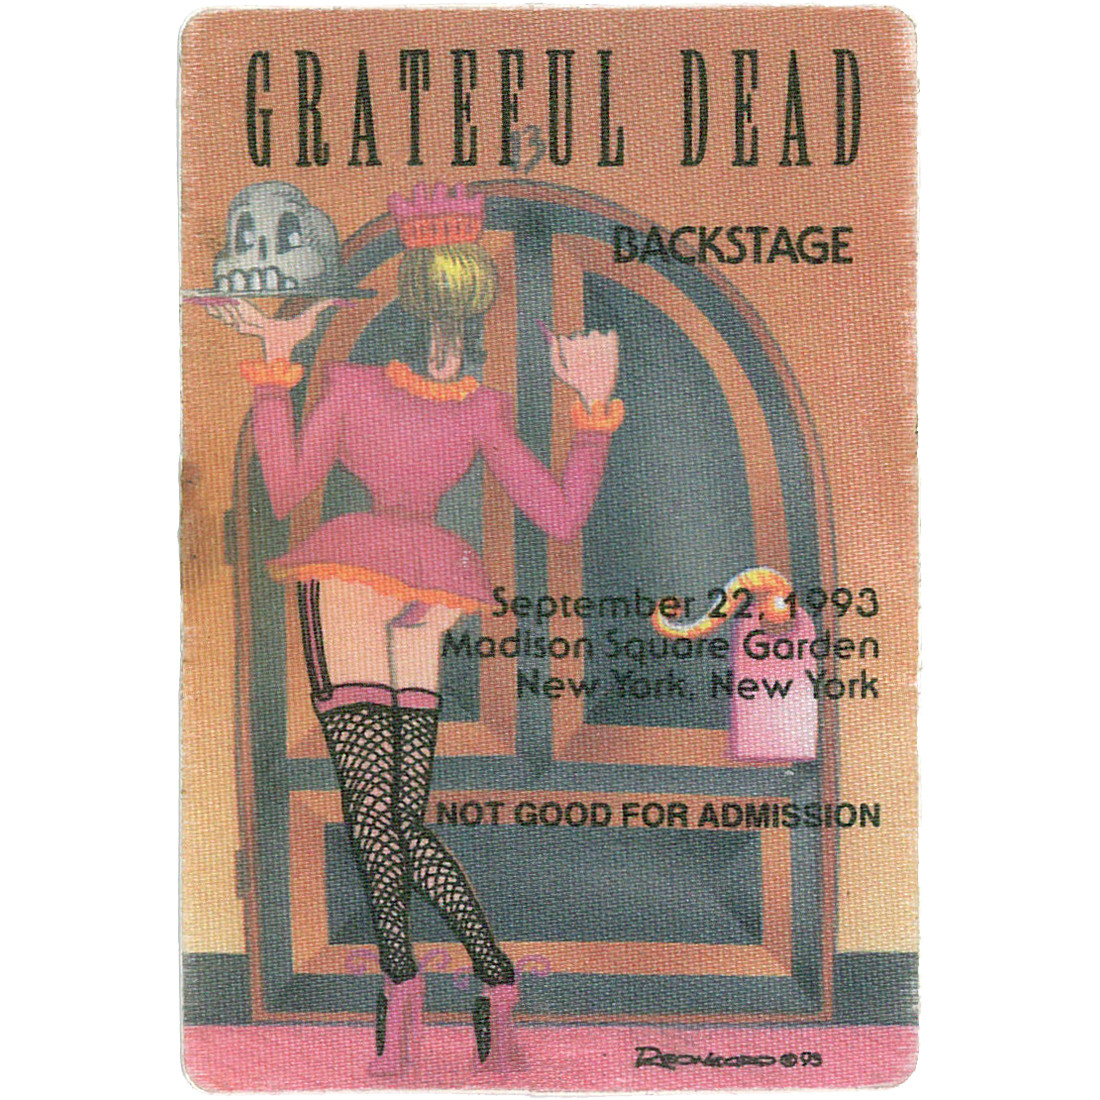 Grateful Dead 1993 09-22 Backstage Pass